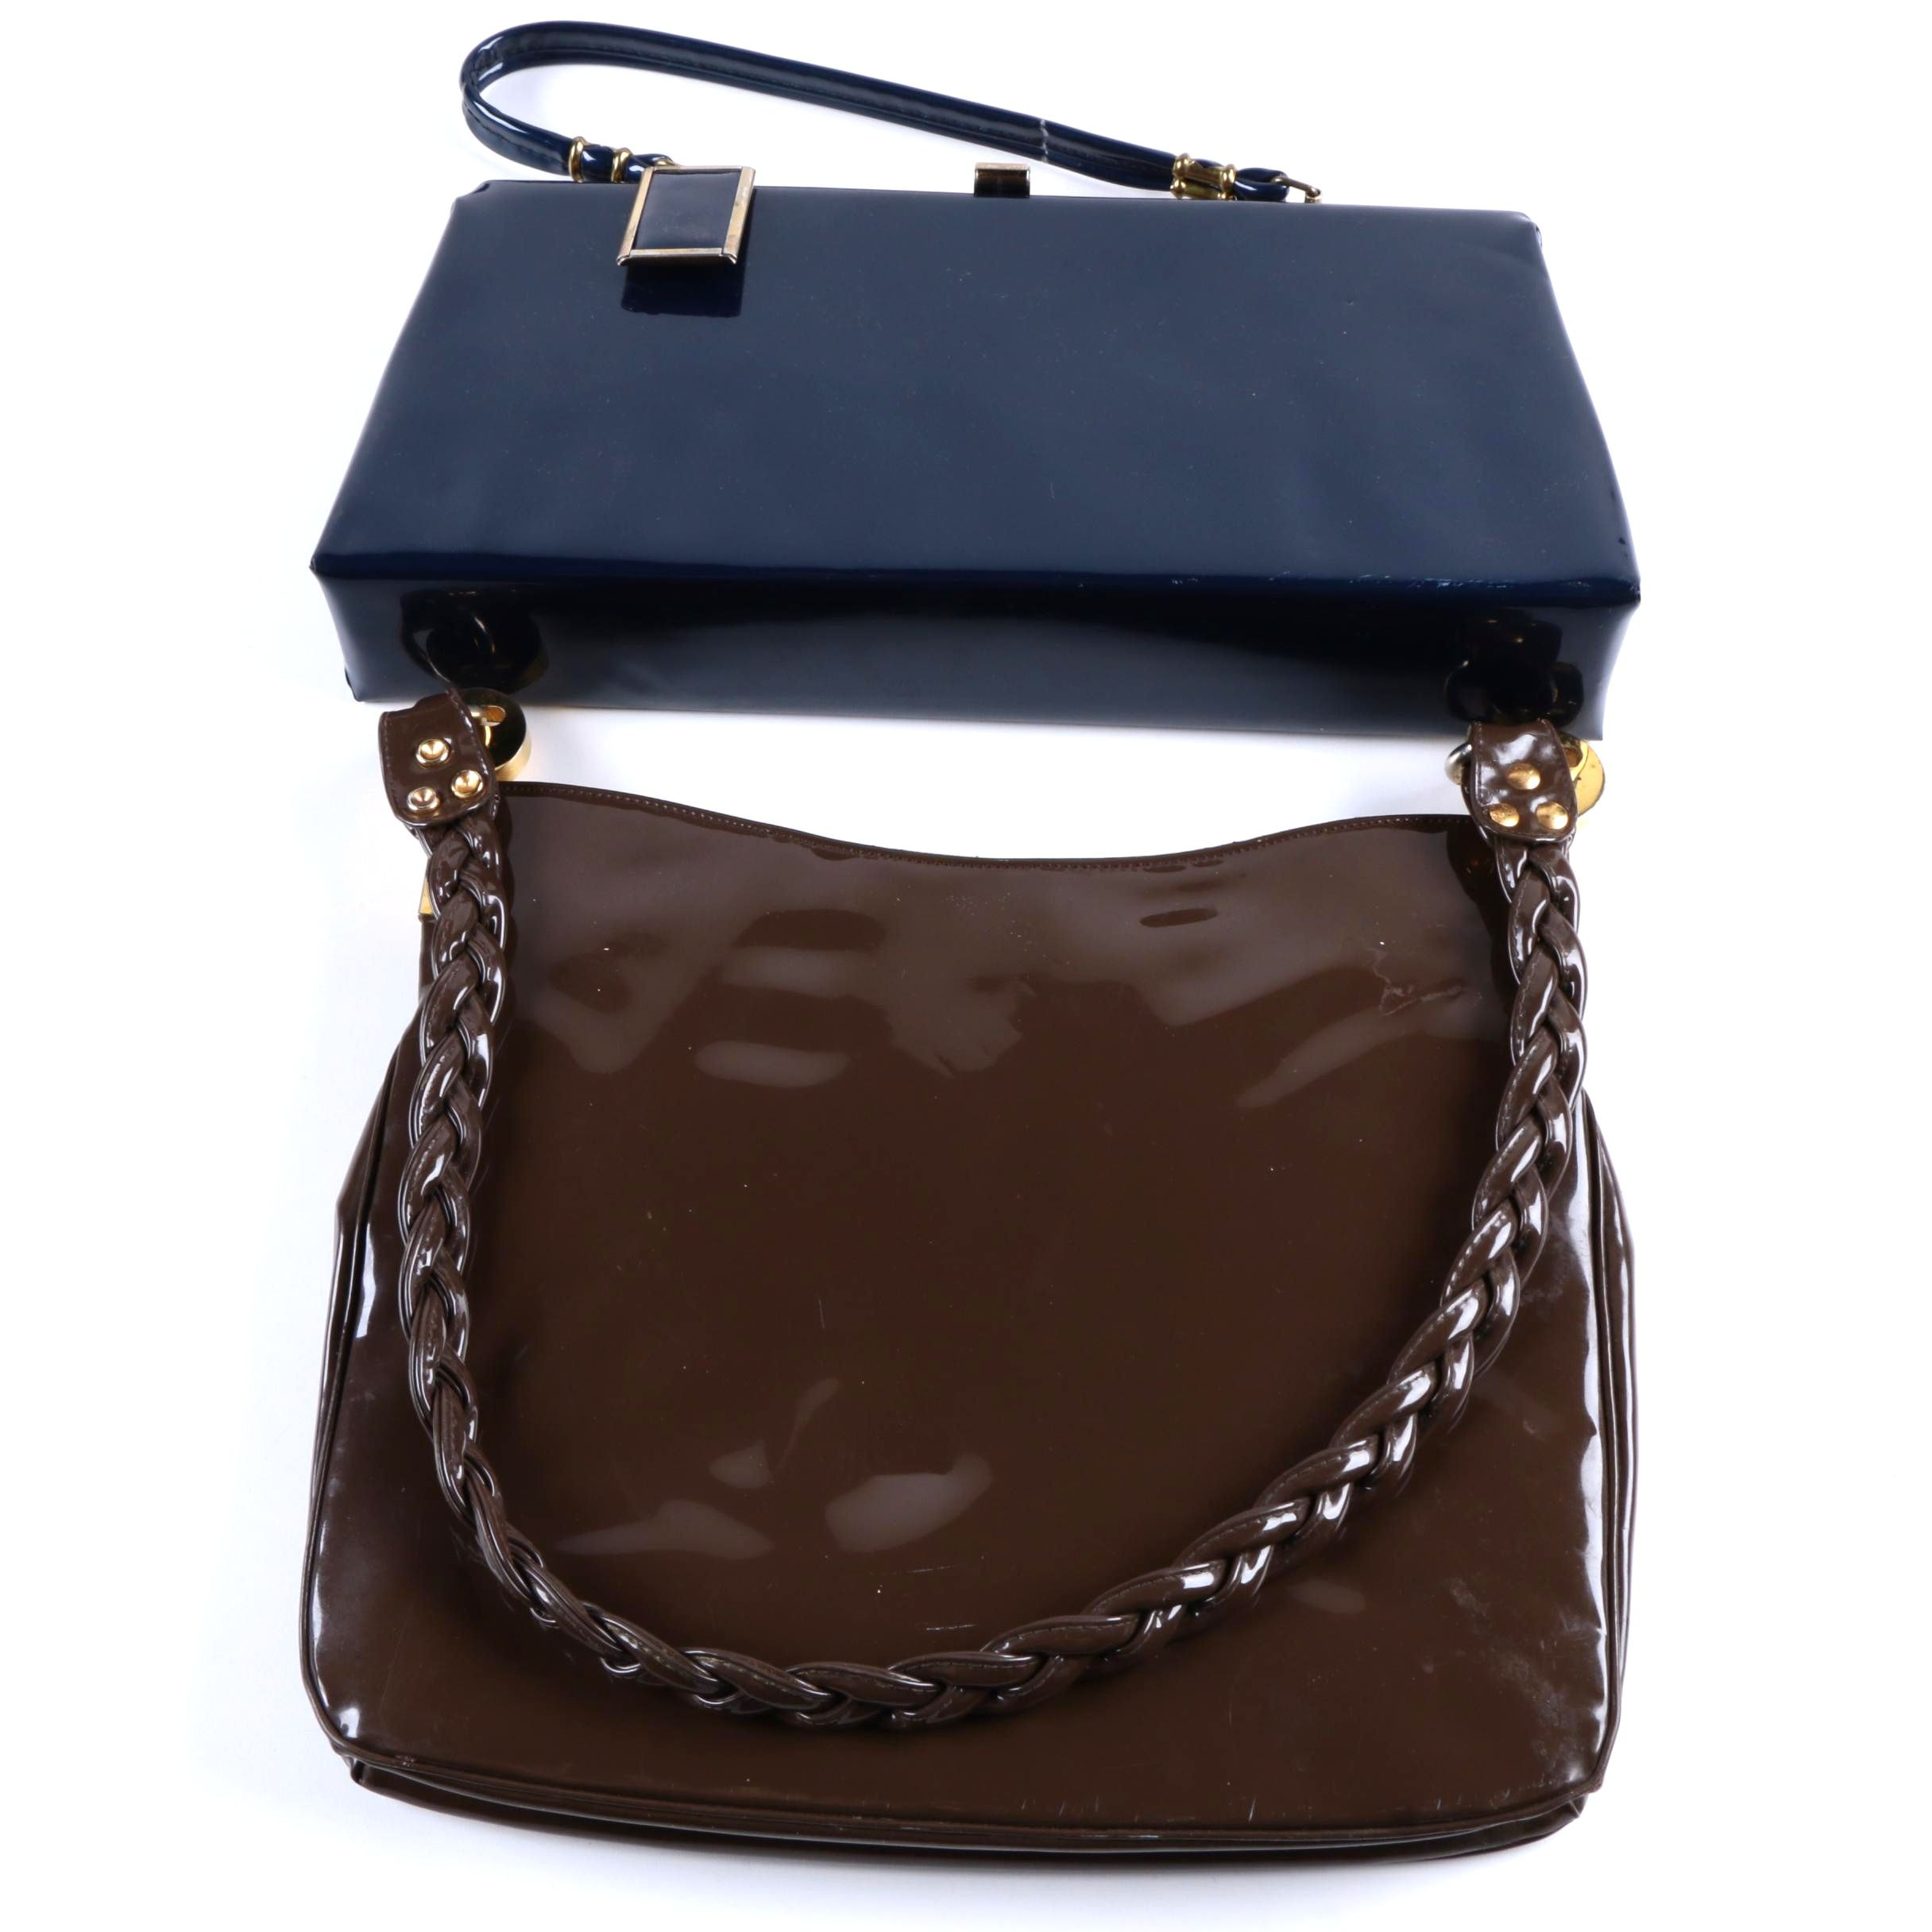 Vintage Patent Leather Handbags